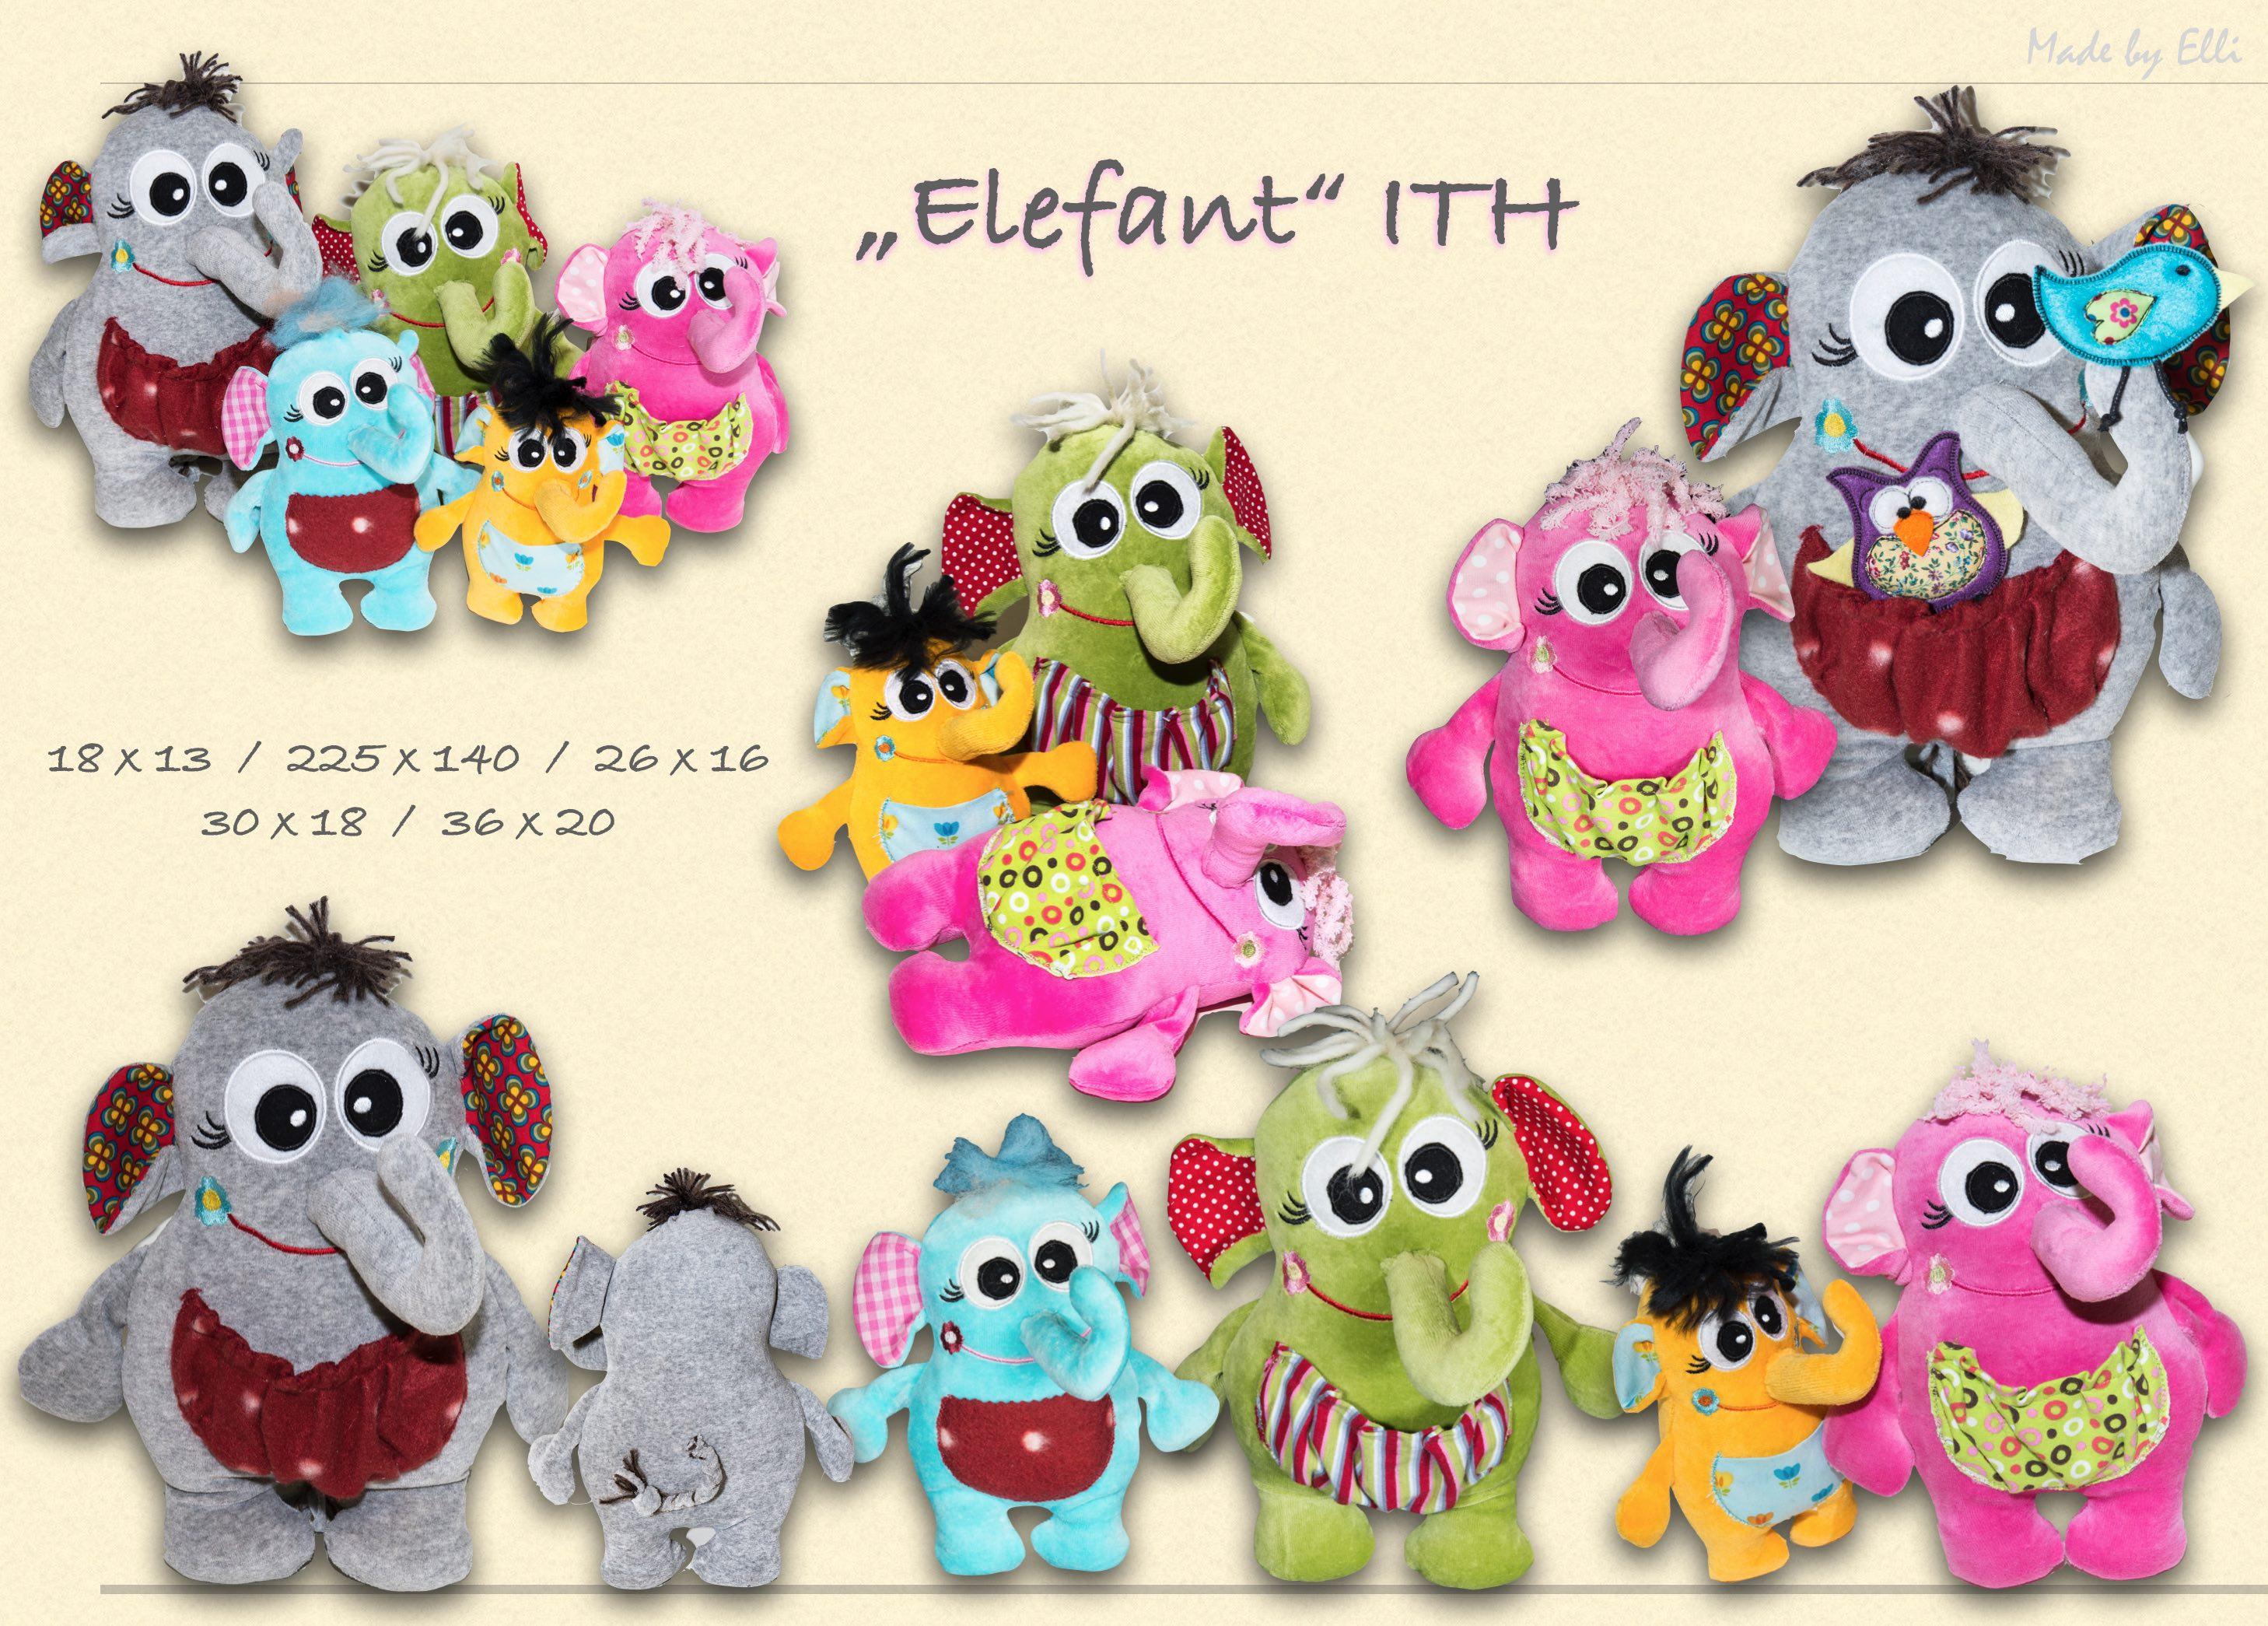 Elefanten iTH